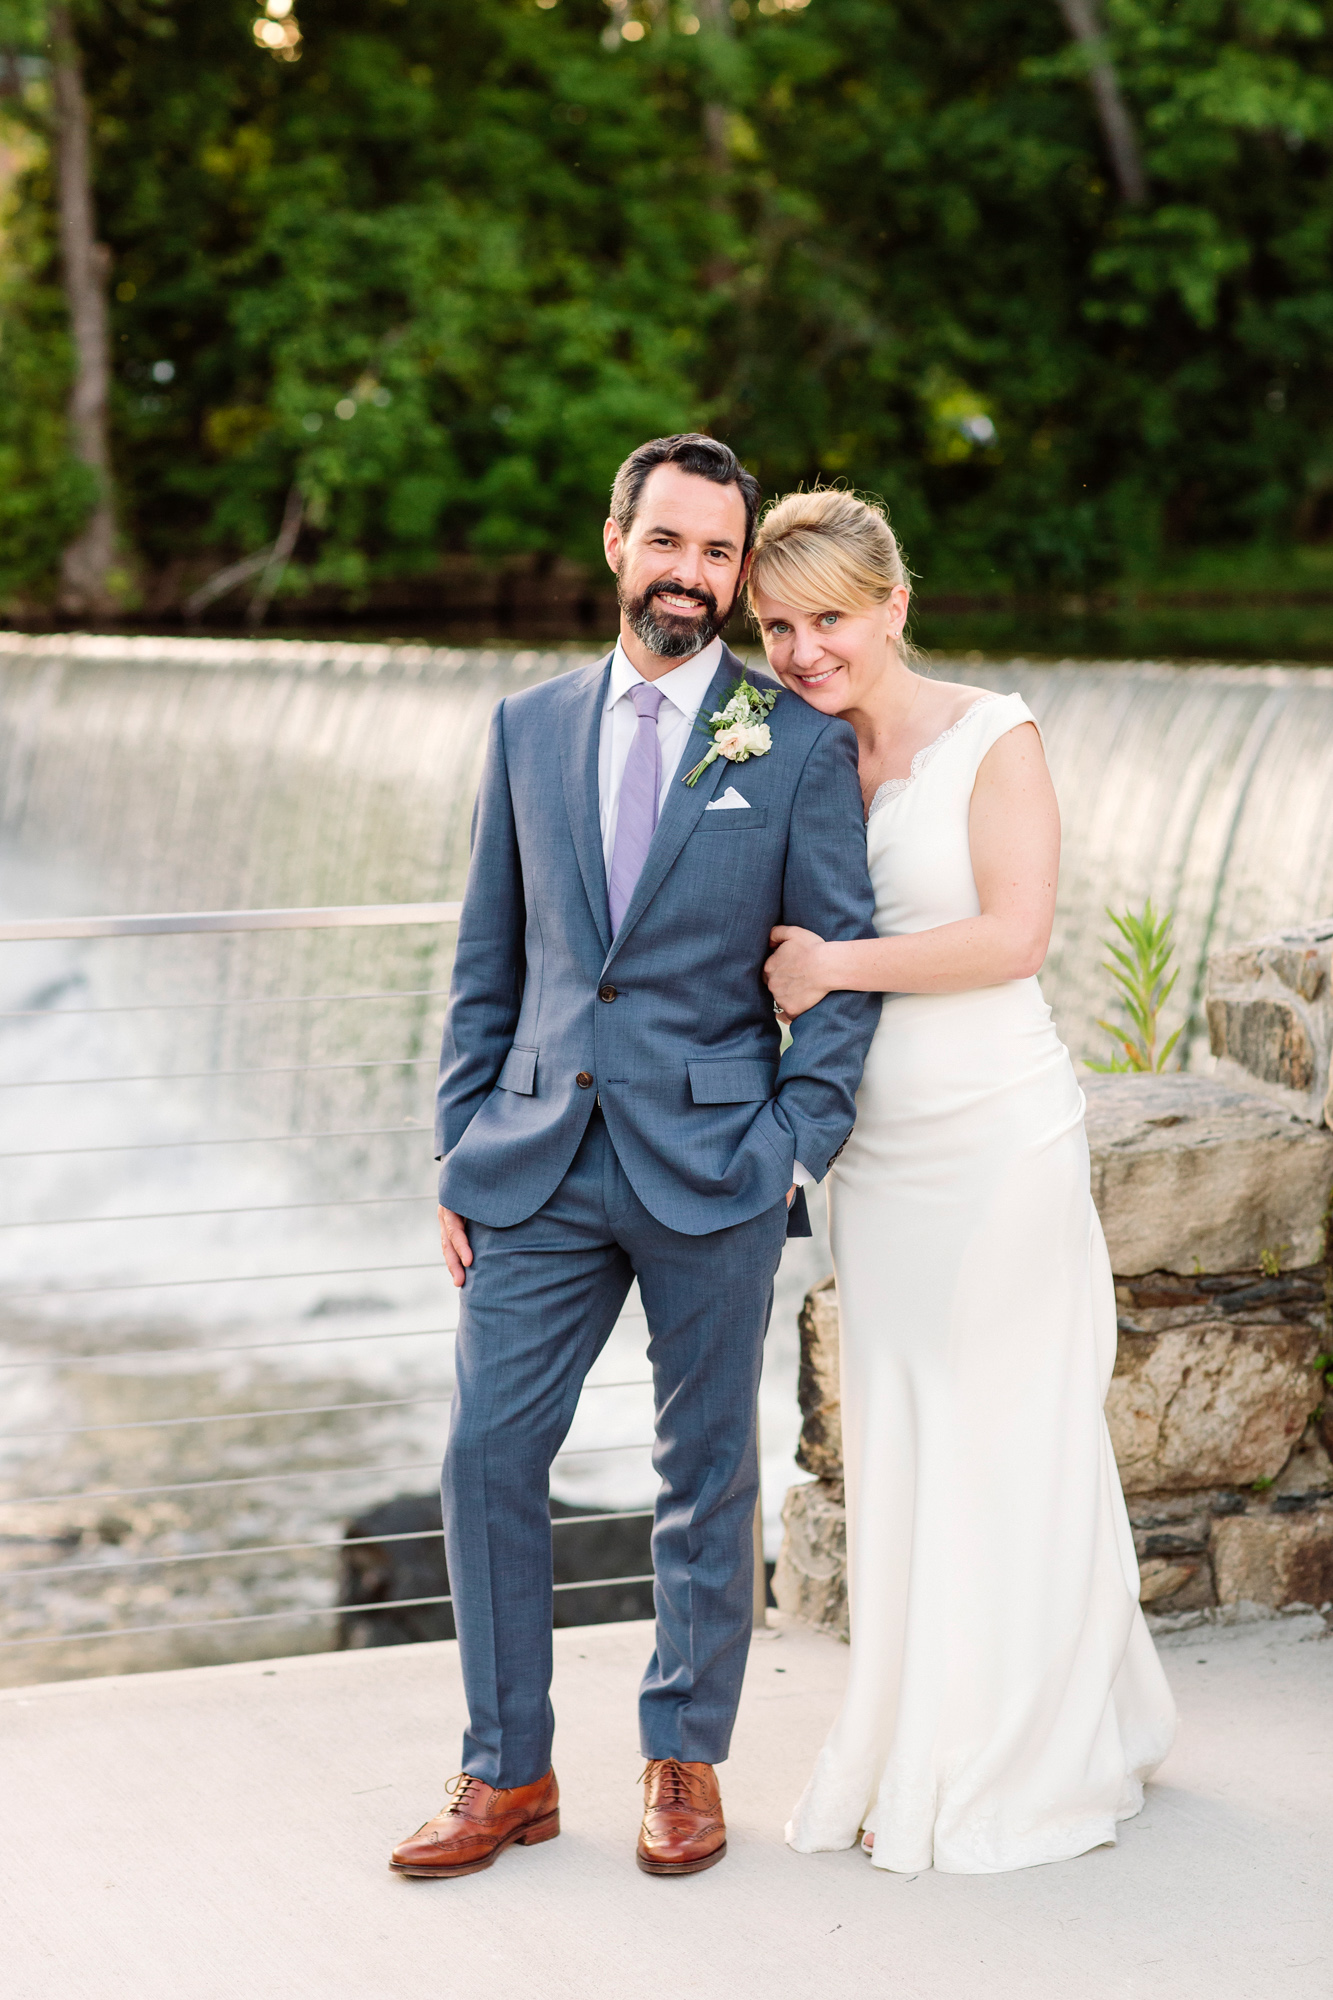 02_Rowan_Brian_The_Roundhouse_Wedding_Beacon_NY_Tanya_Salazar_Photography_289.jpg